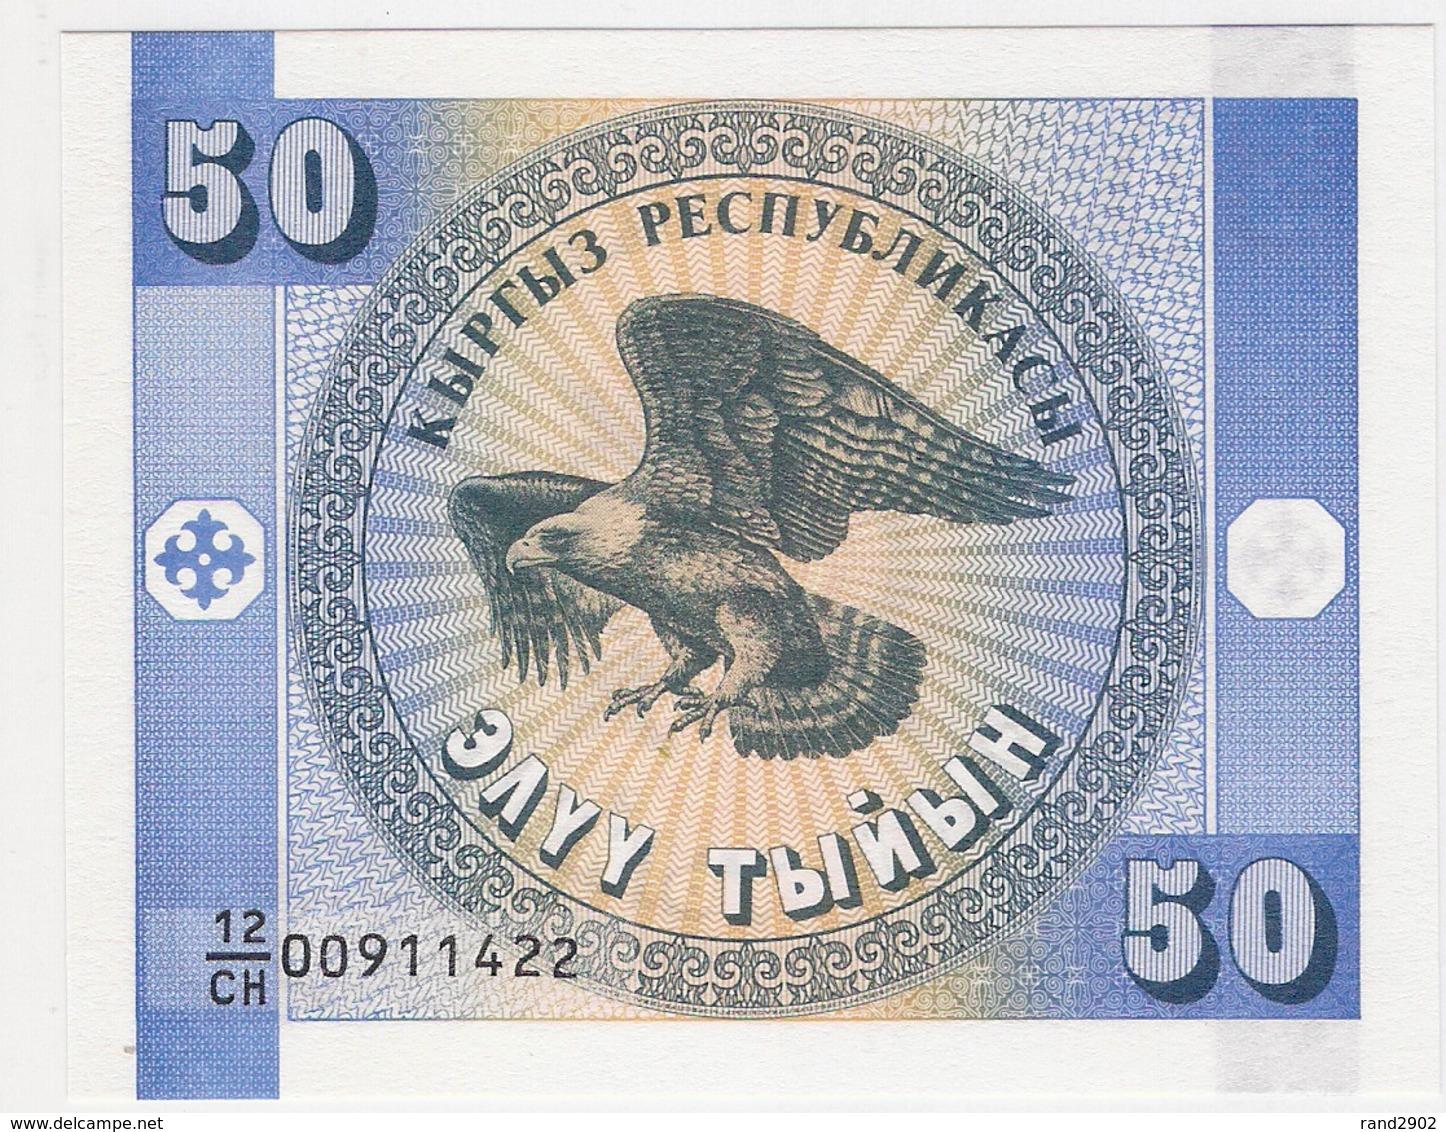 Kyrgyzstan 50 Tyiyn 1993 (1) P-3 UNC /007B/ - Kirgisistan